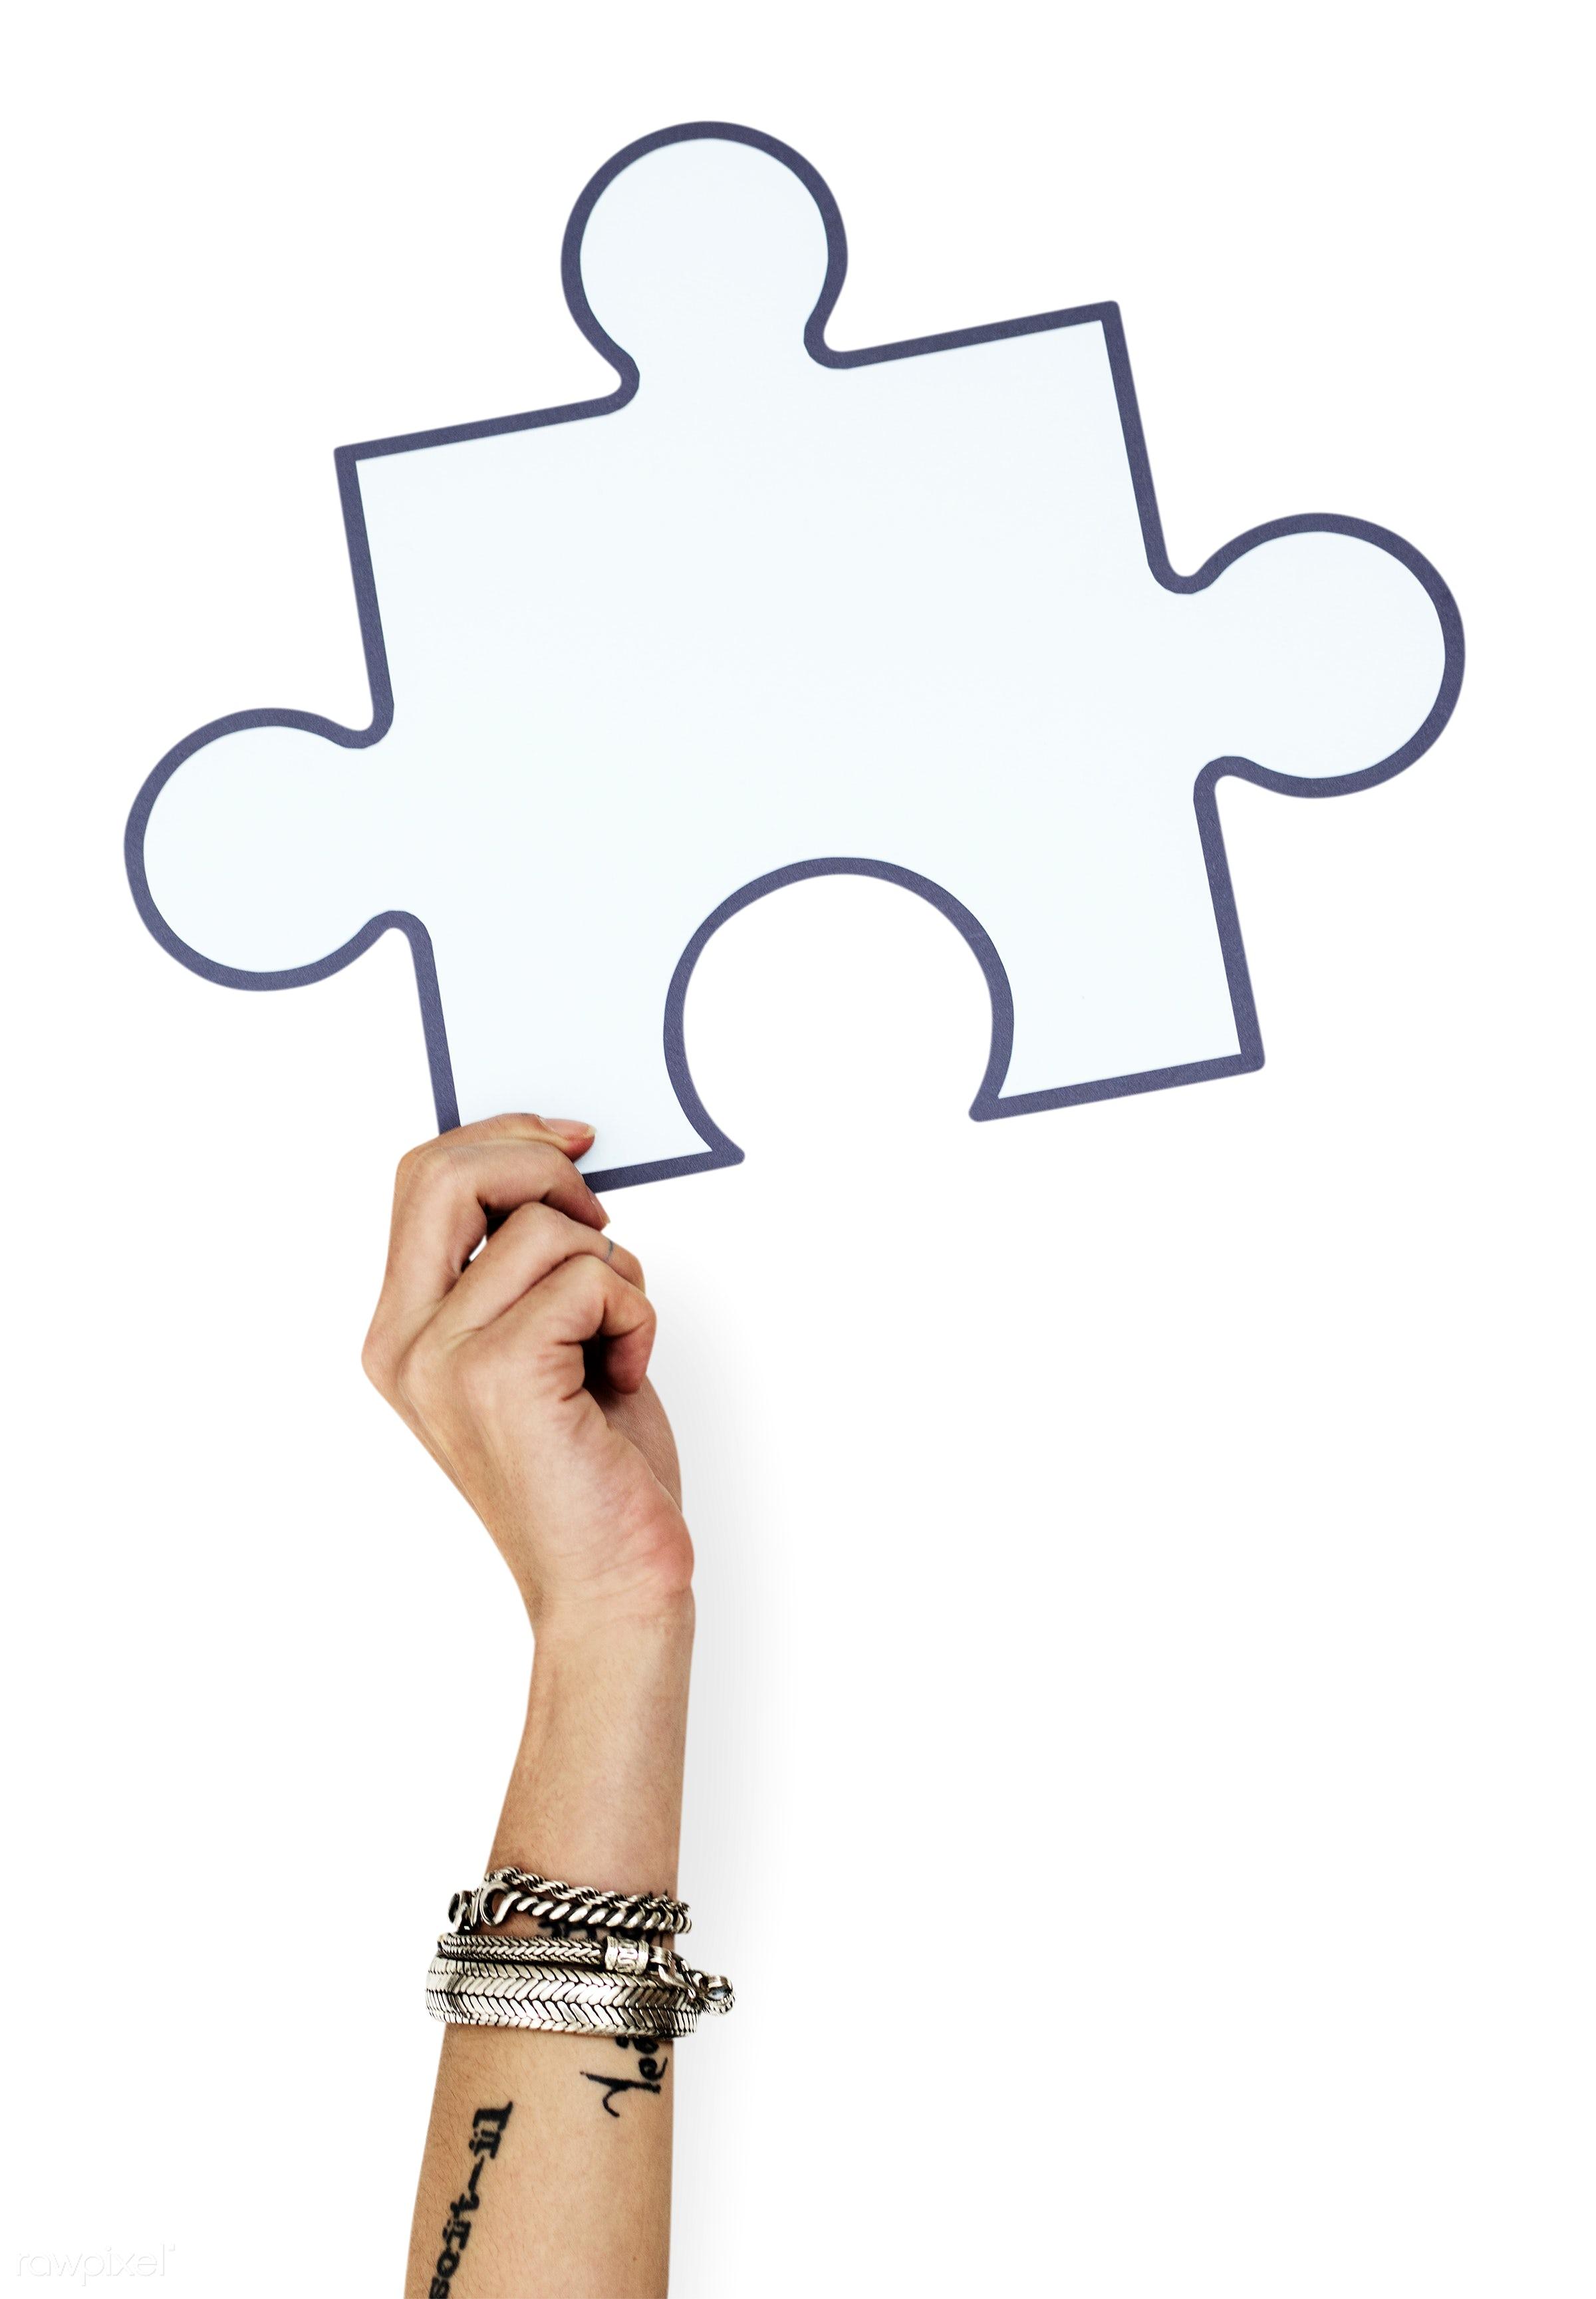 studio, craft, raise, jigsaw, holding, paper, handicraft, illustration, hand, arm, puzzle, isolated, symbol, white, game,...